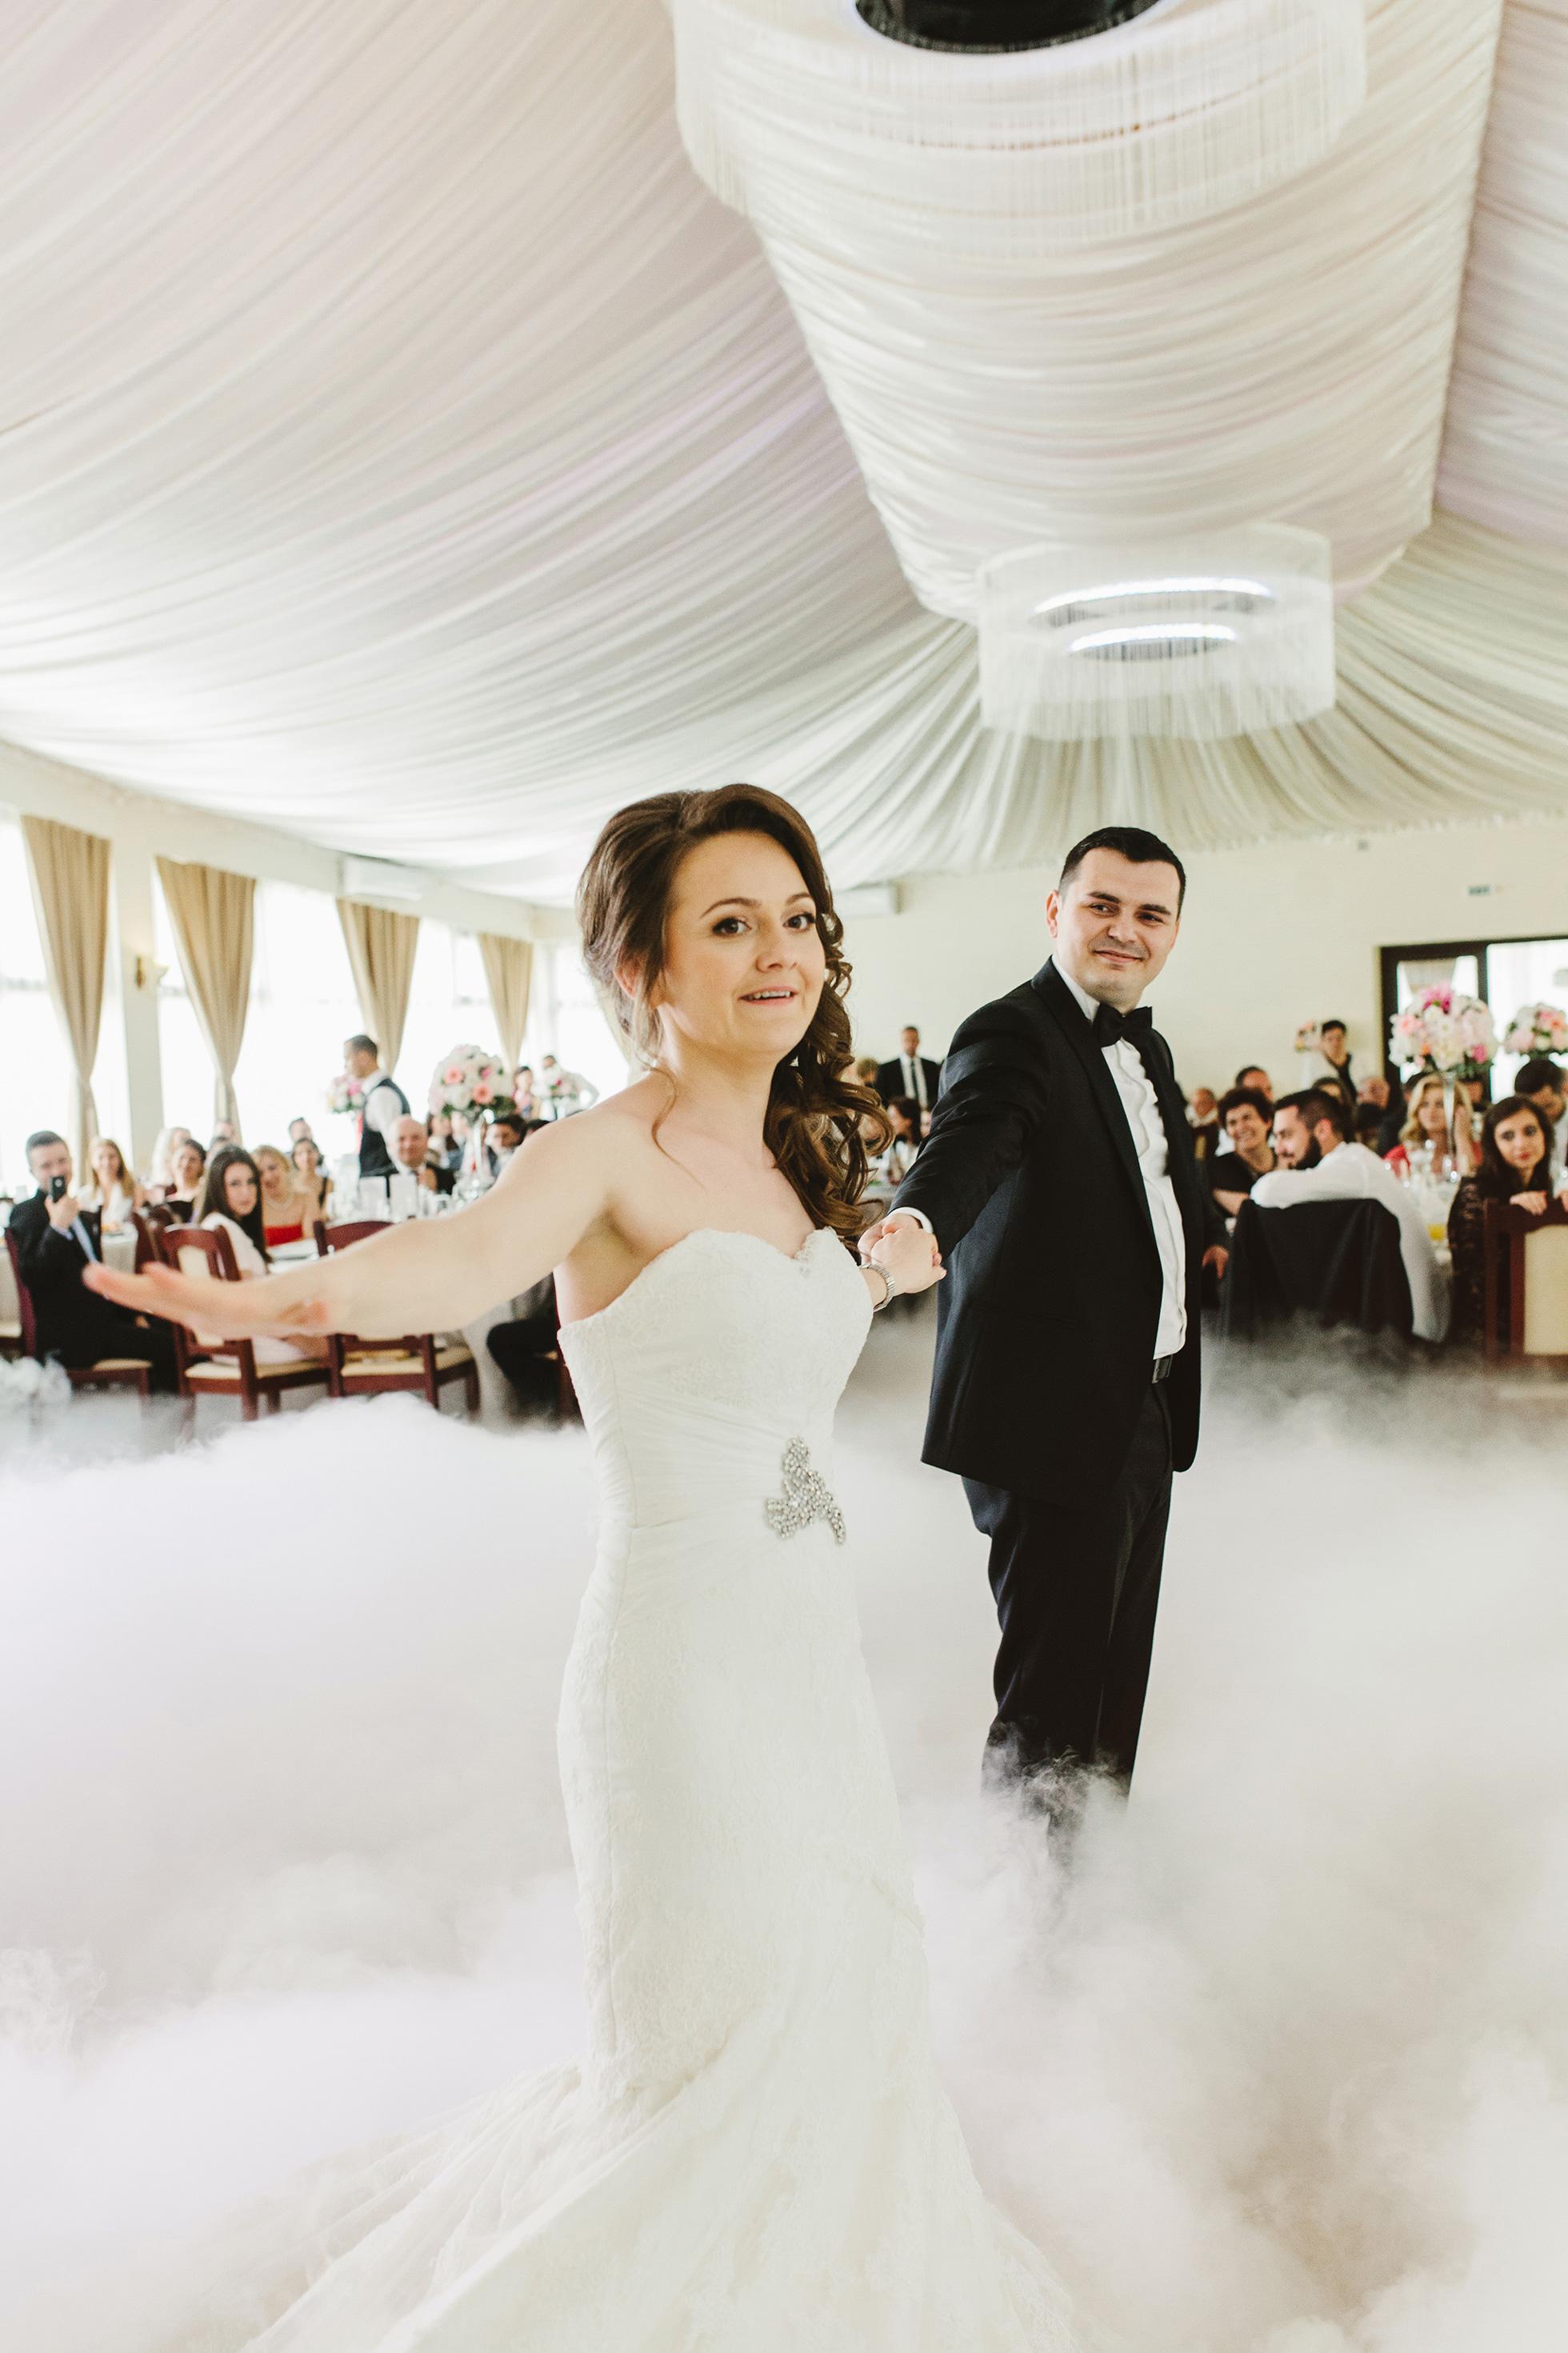 Liana-+-Florin-{wedding}-153